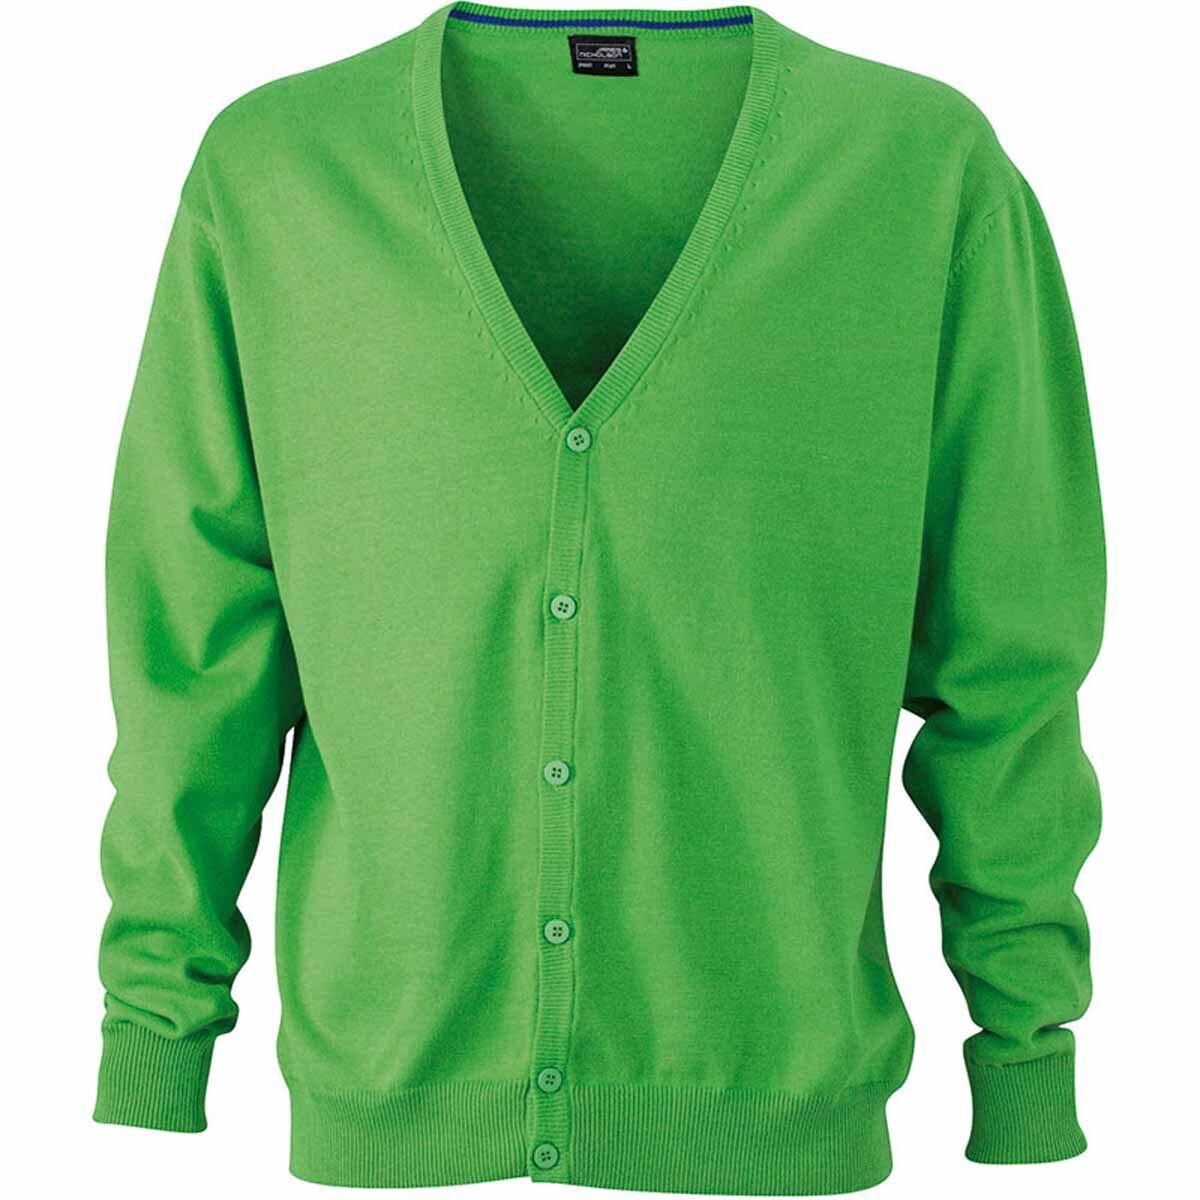 Gilet boutonné cardigan - HOMME - JN661 - vert